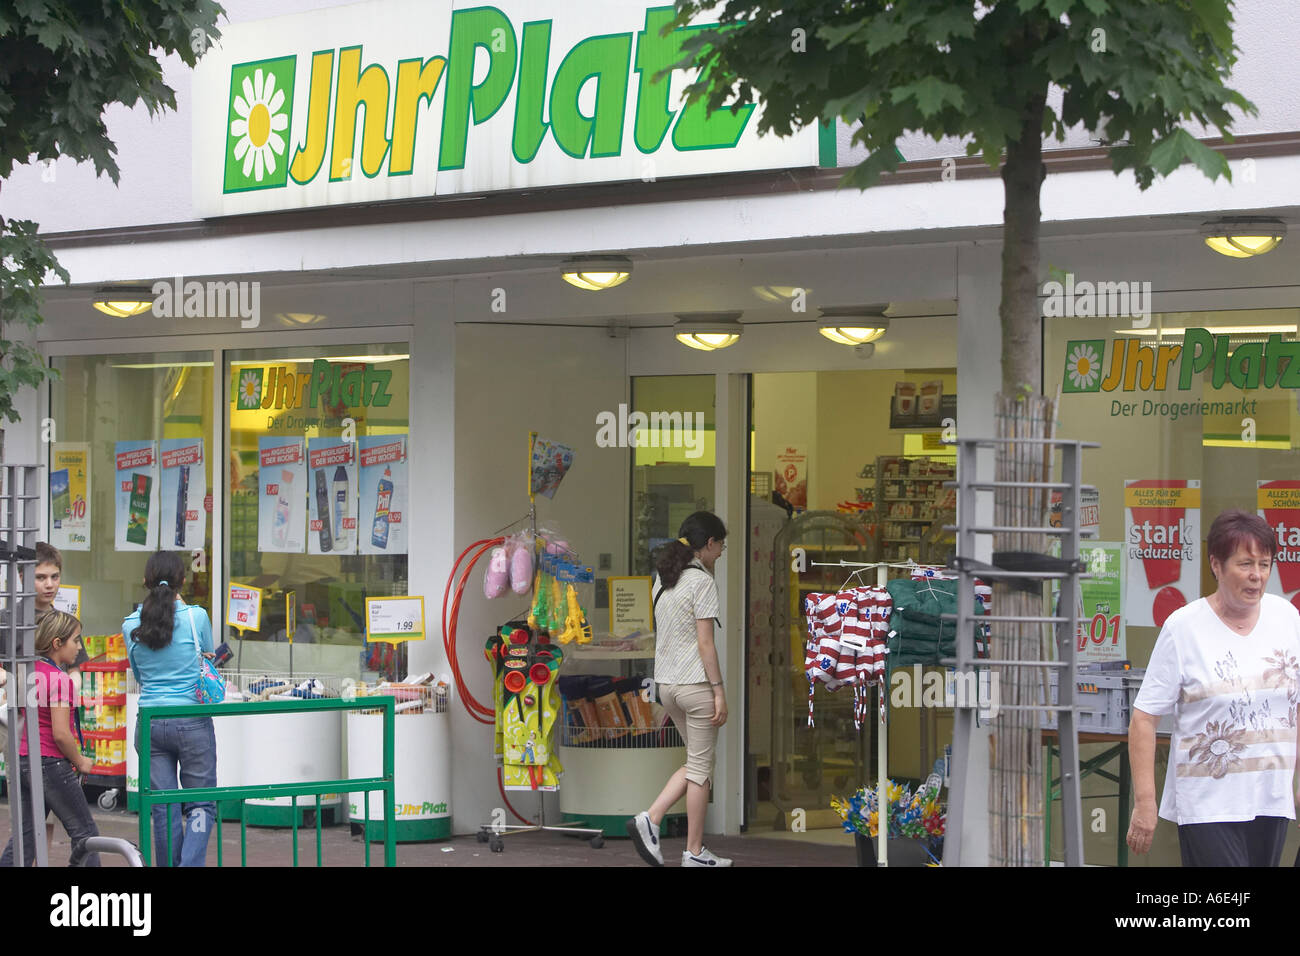 Insolvency announced 30.05.2005 Mannheim, DEU Germany fifth-largest drugstore chain Ihr Platz - Stock Image